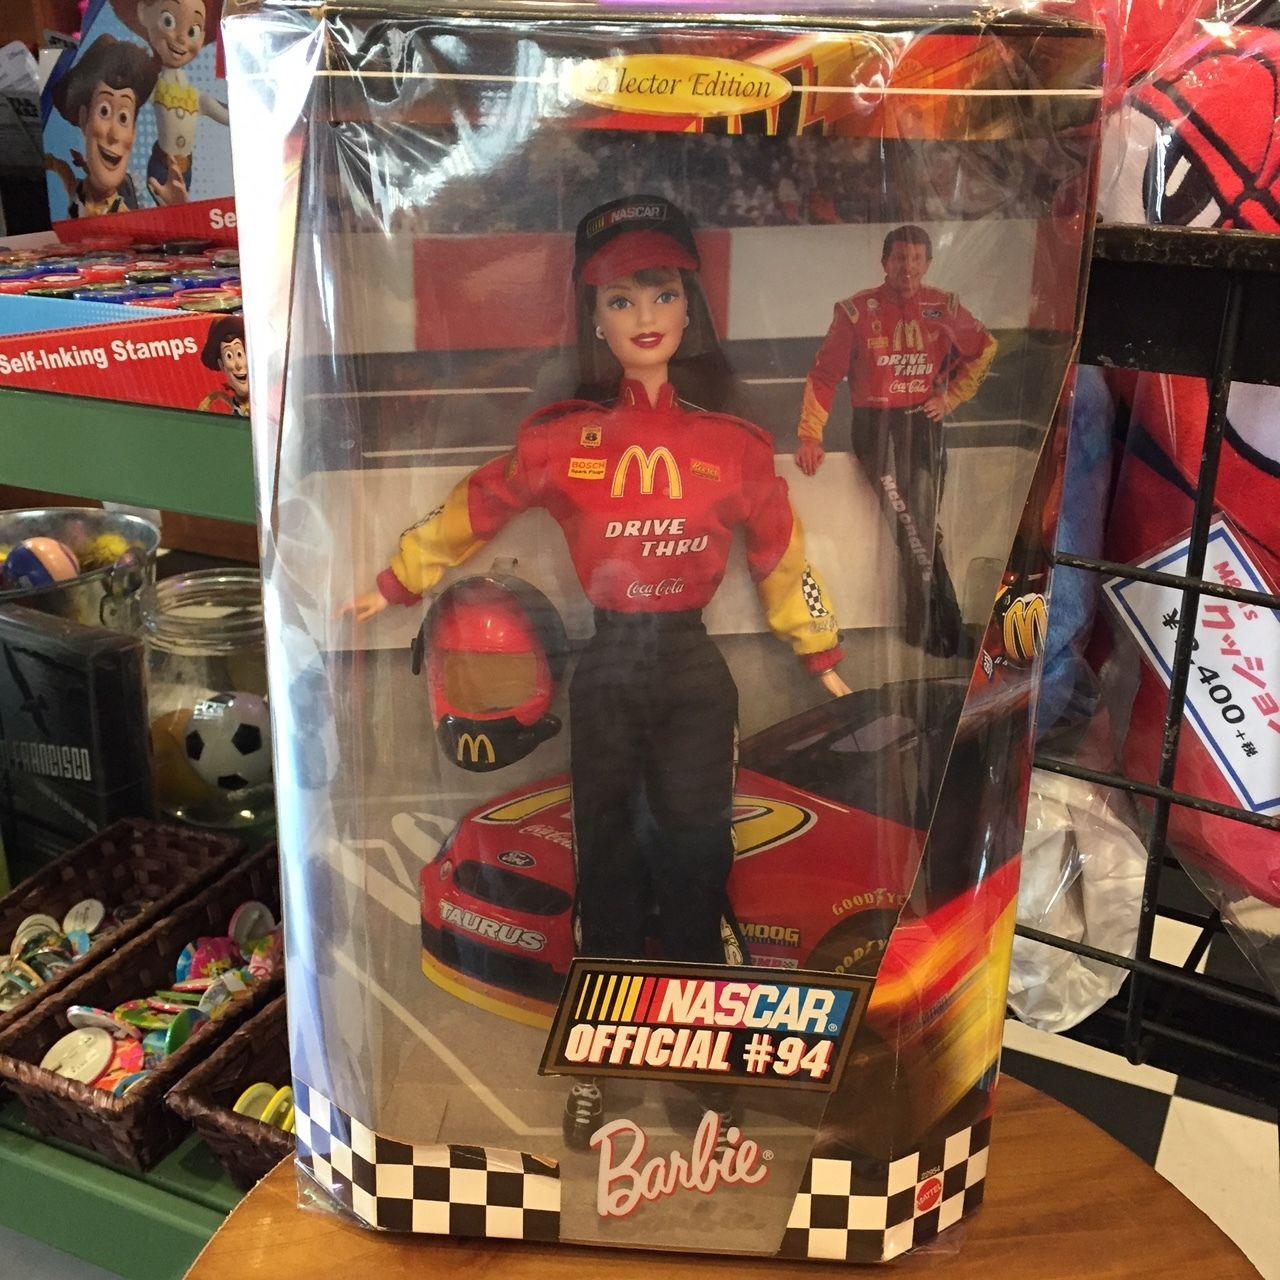 Barbie NASCAR Official #94 (マクドナルドのレーシングスーツ姿のバービー)